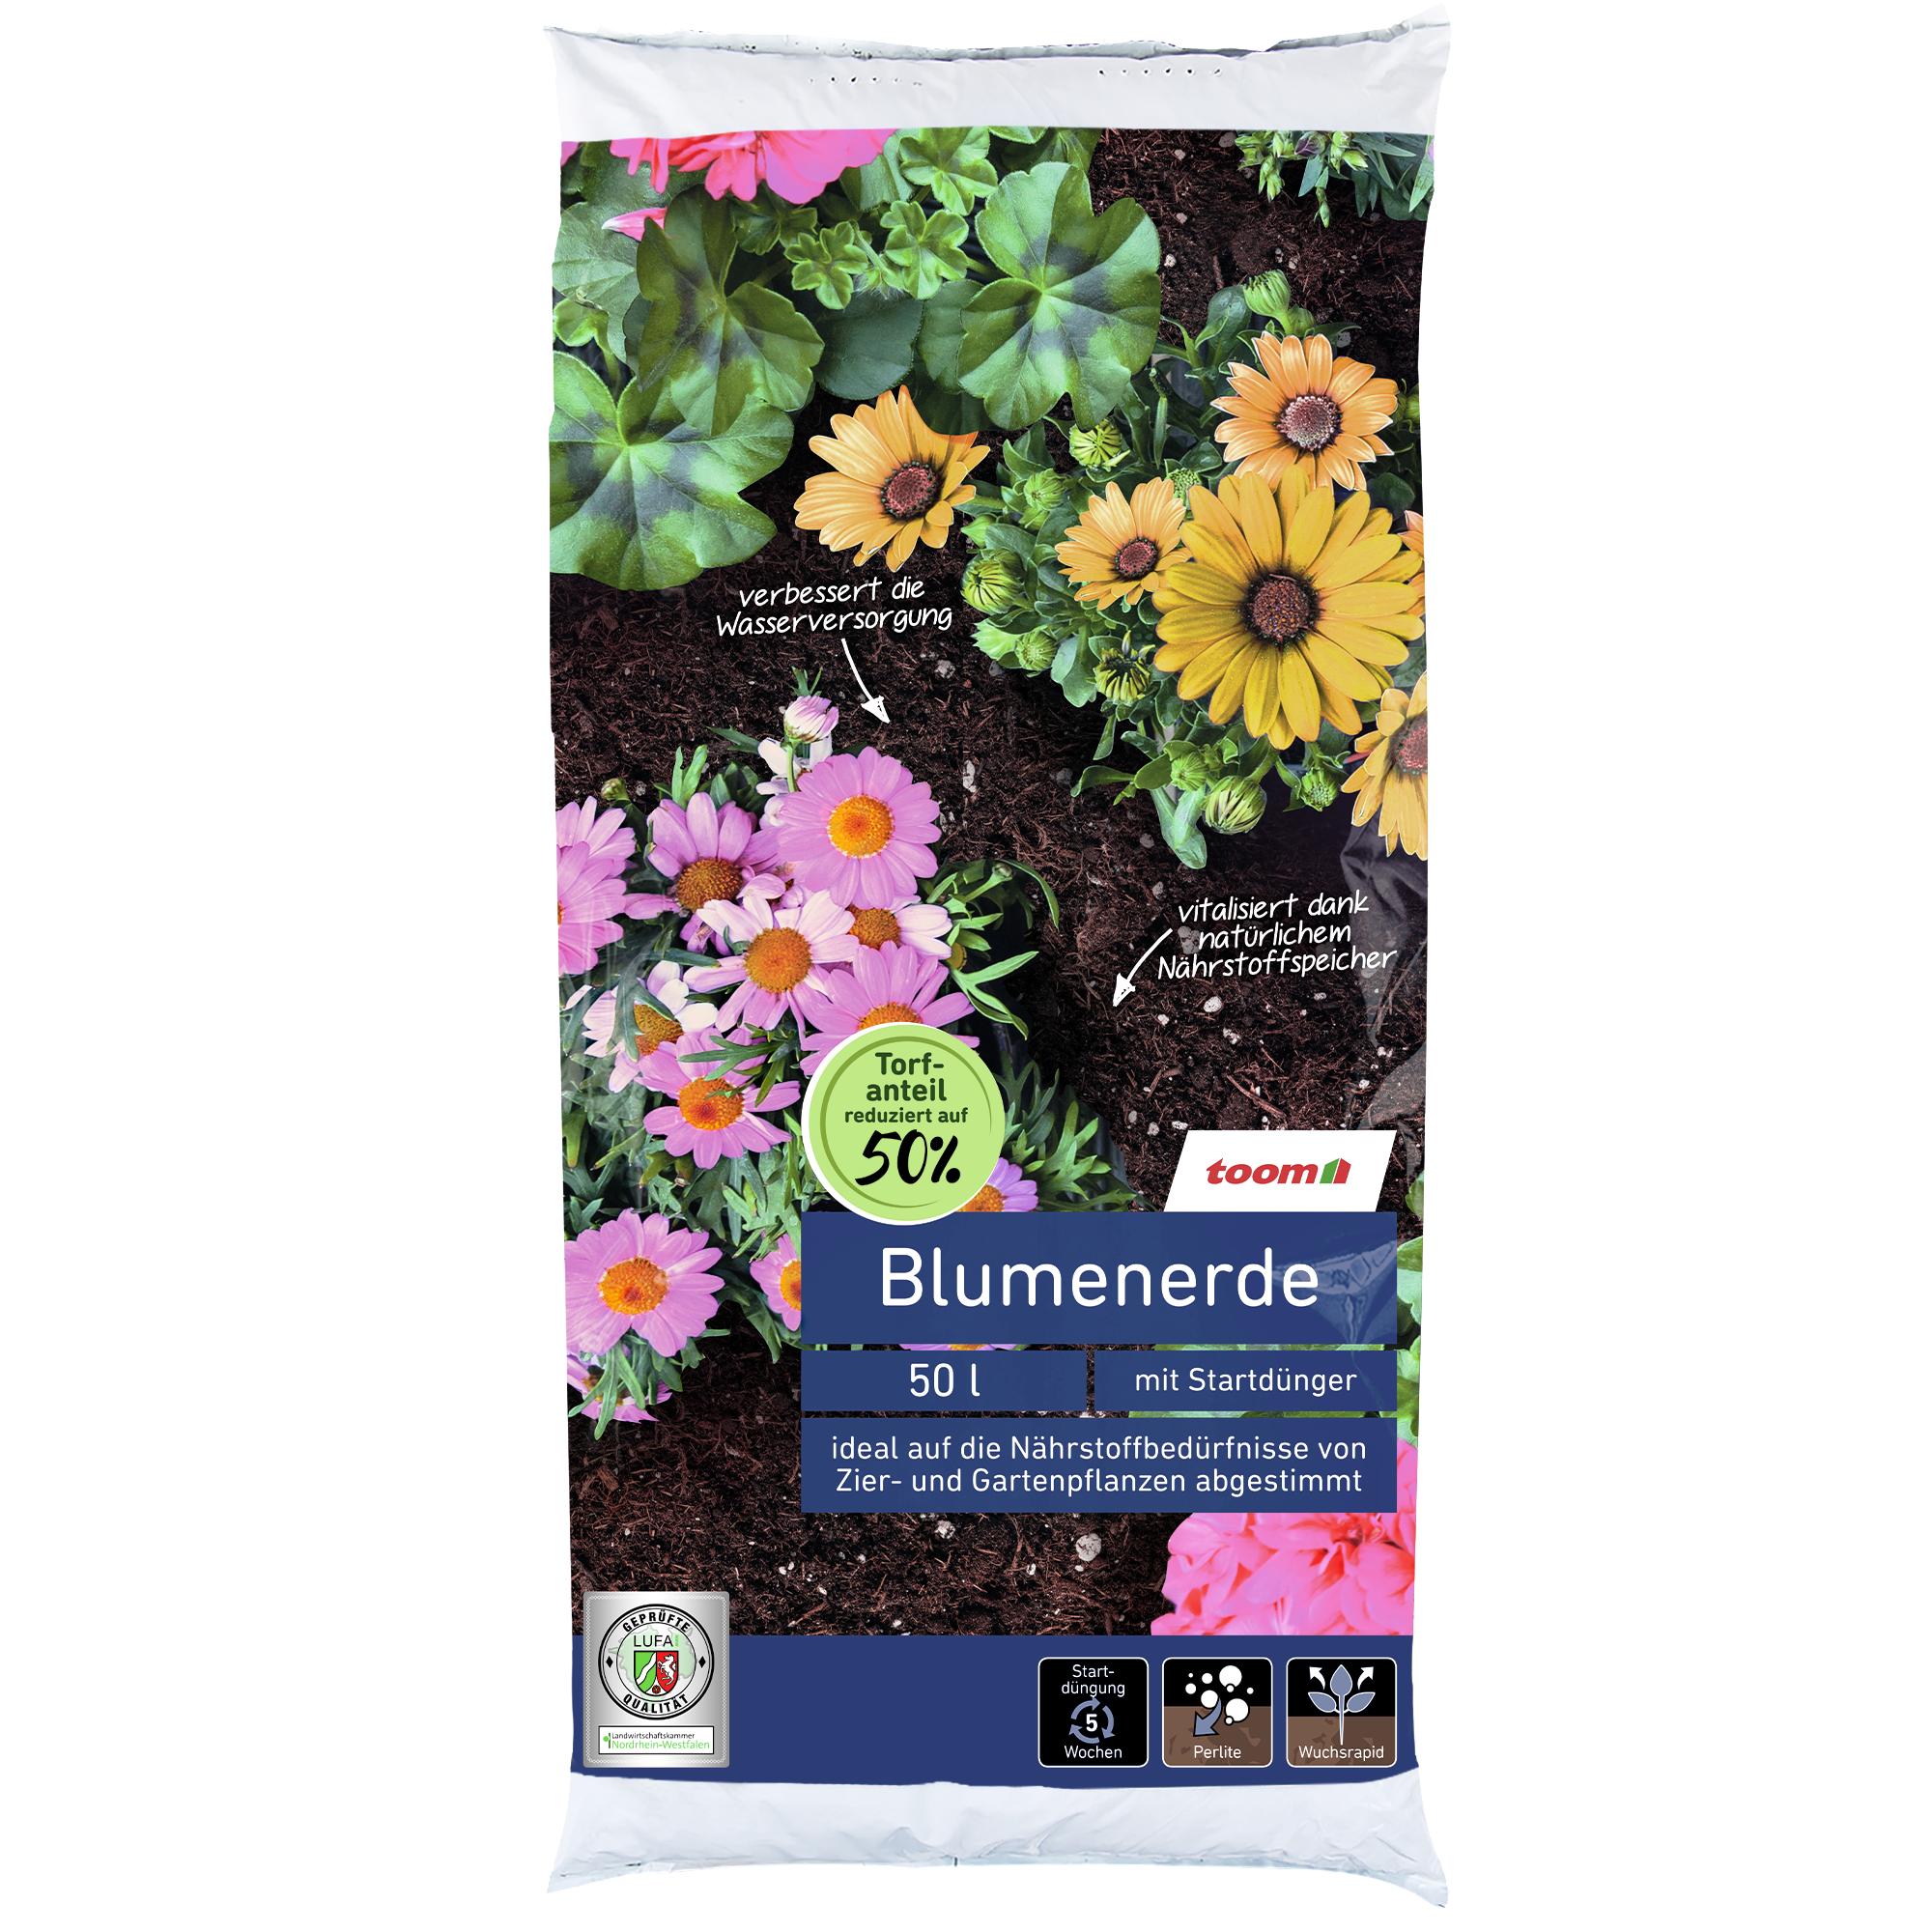 Blumenerde 50 l